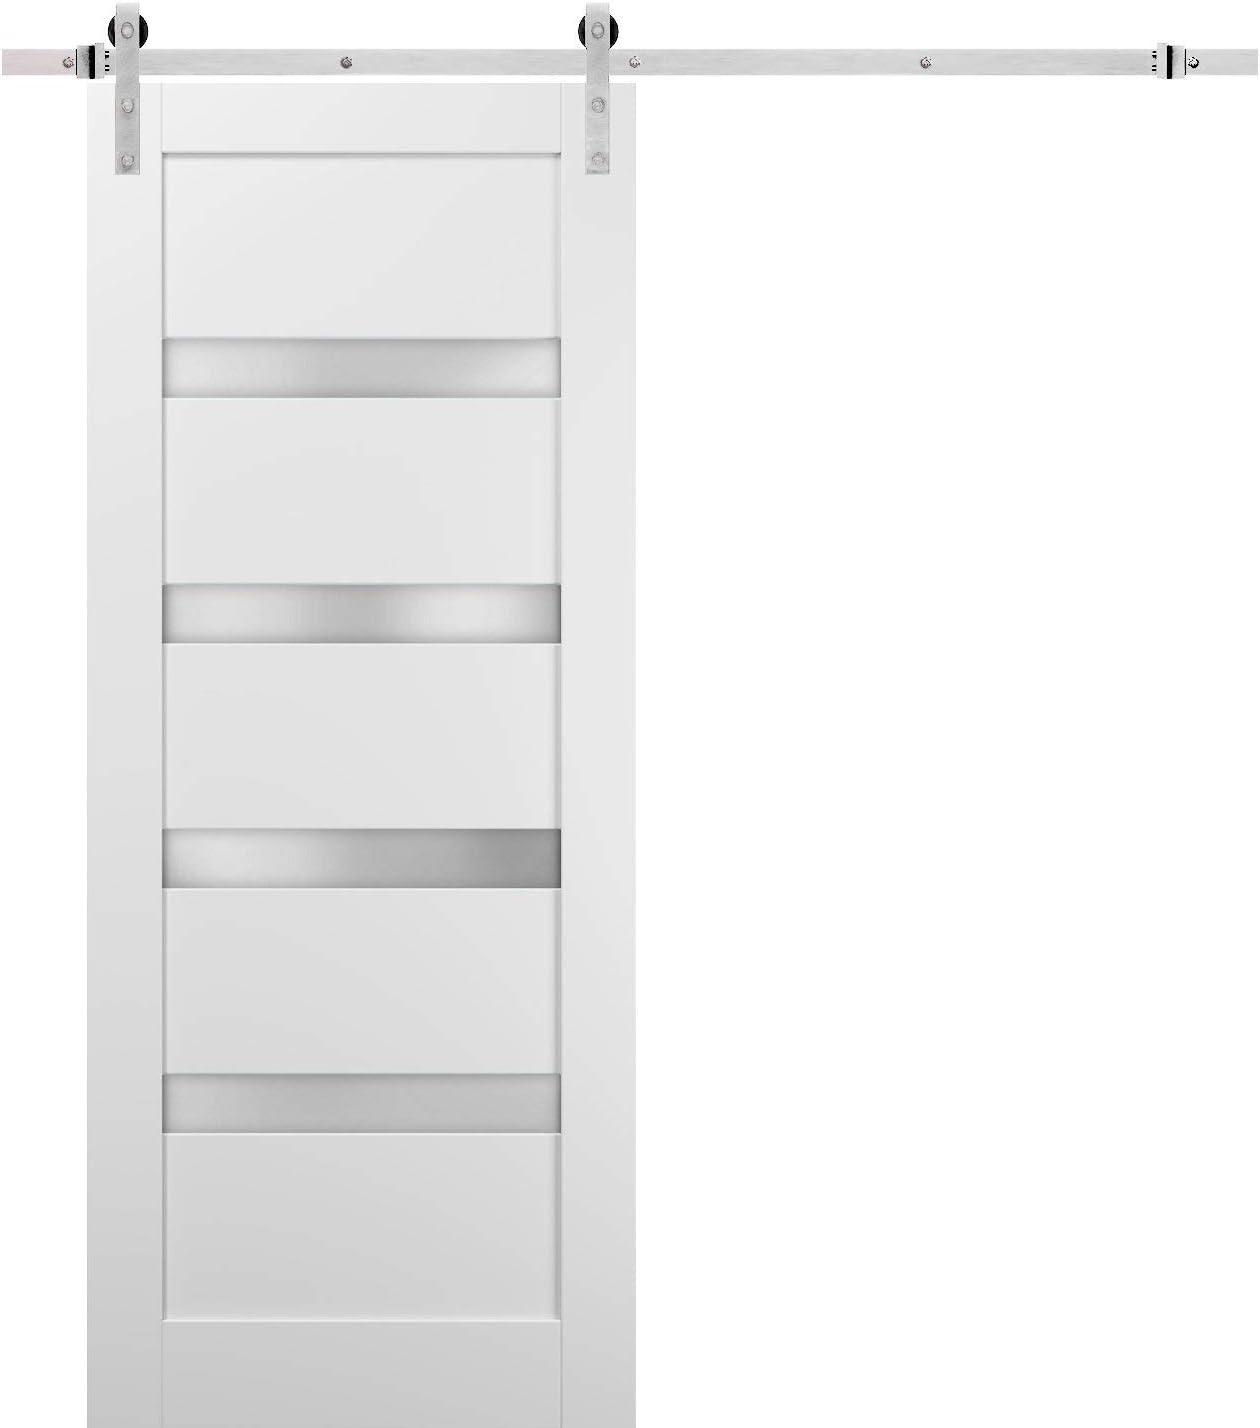 Sliding Barn Popular brand Door 18 x 80 Steel Stainless Hardware 6.6ft with Deluxe